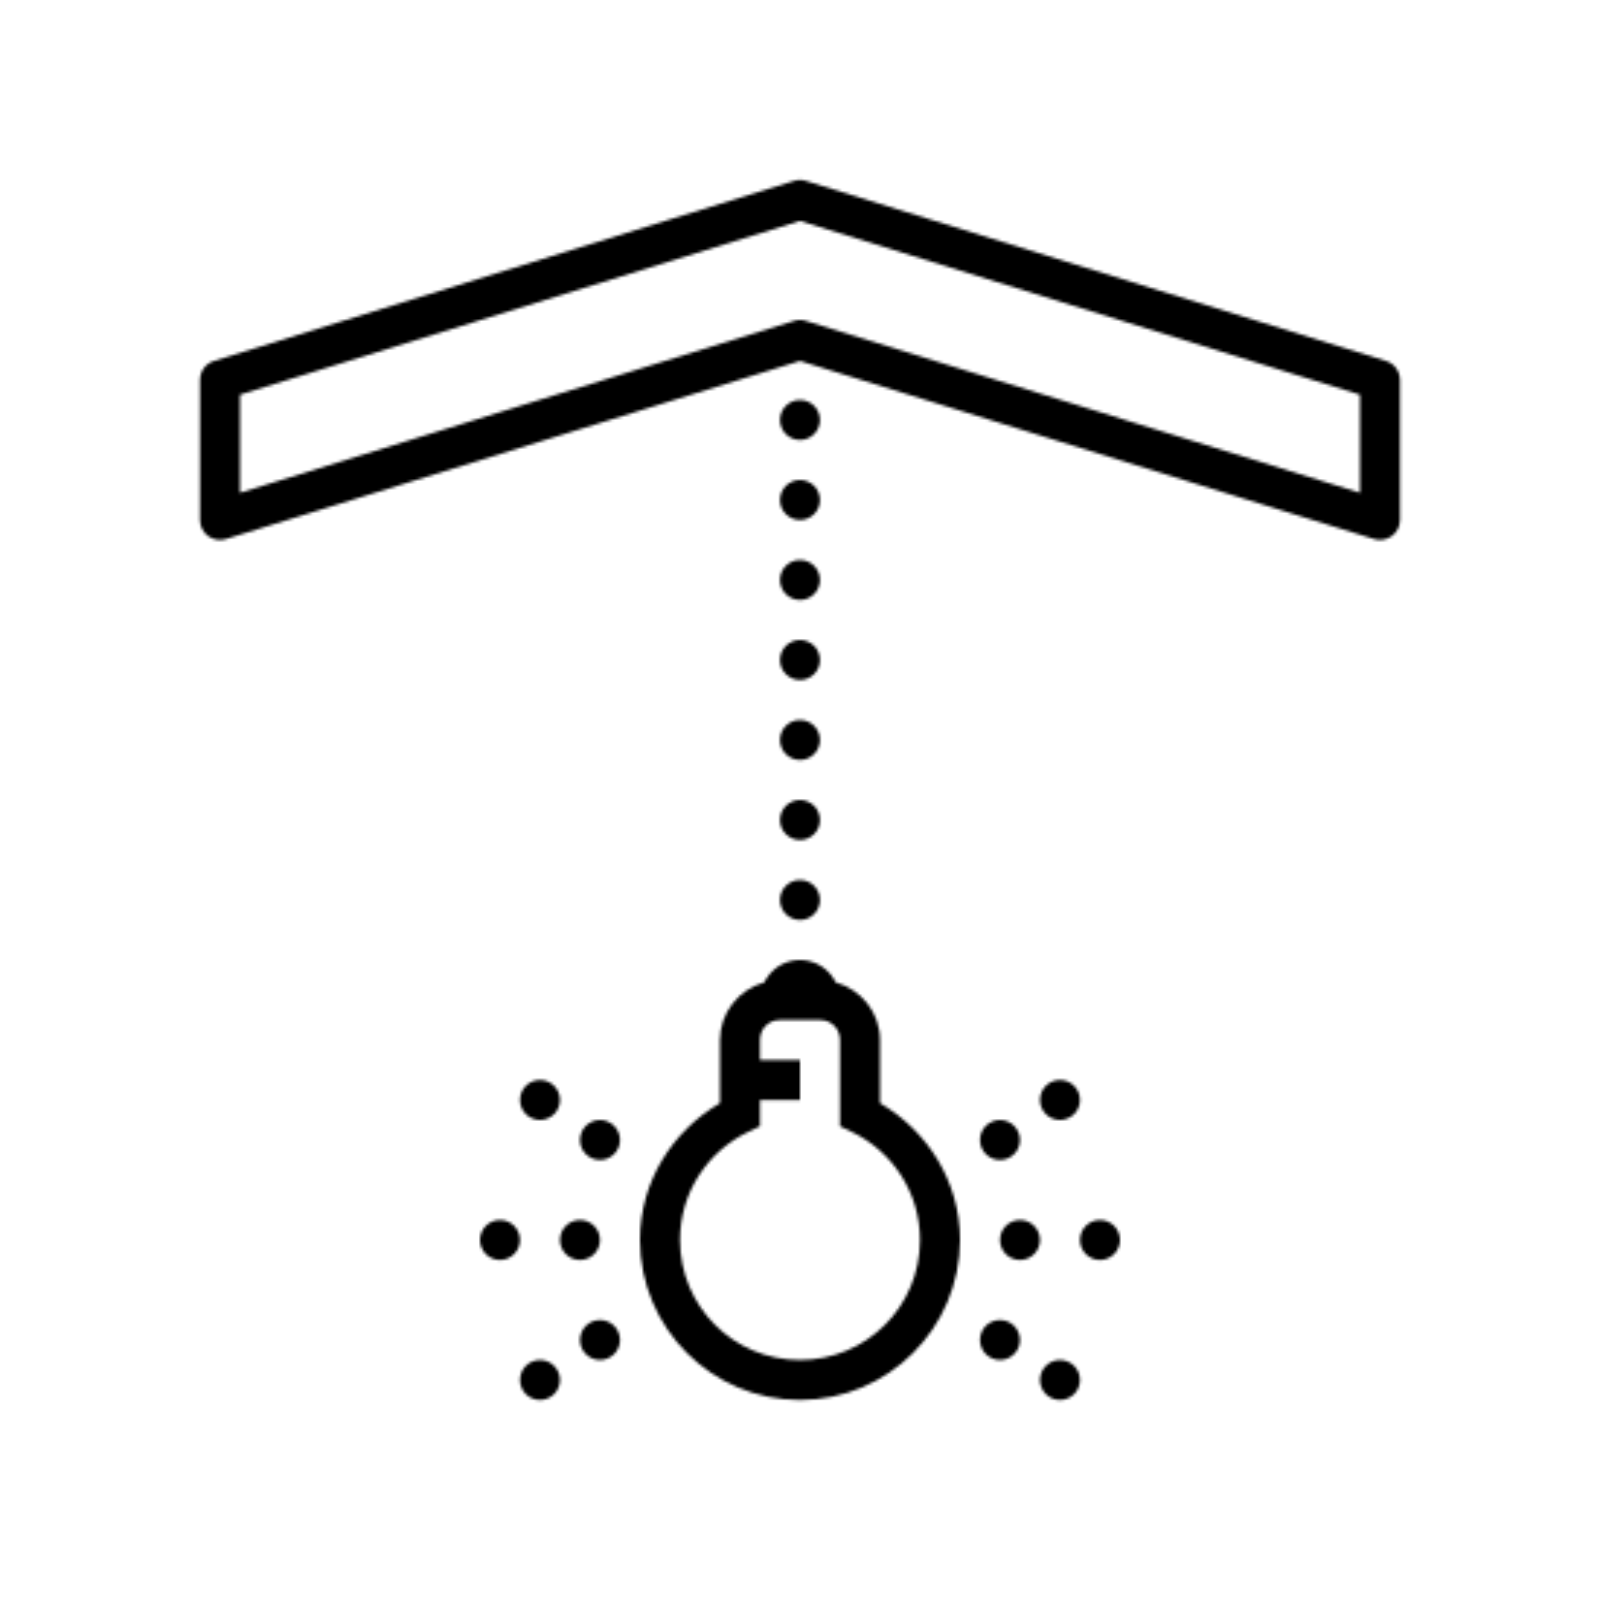 Ceiling Light icon